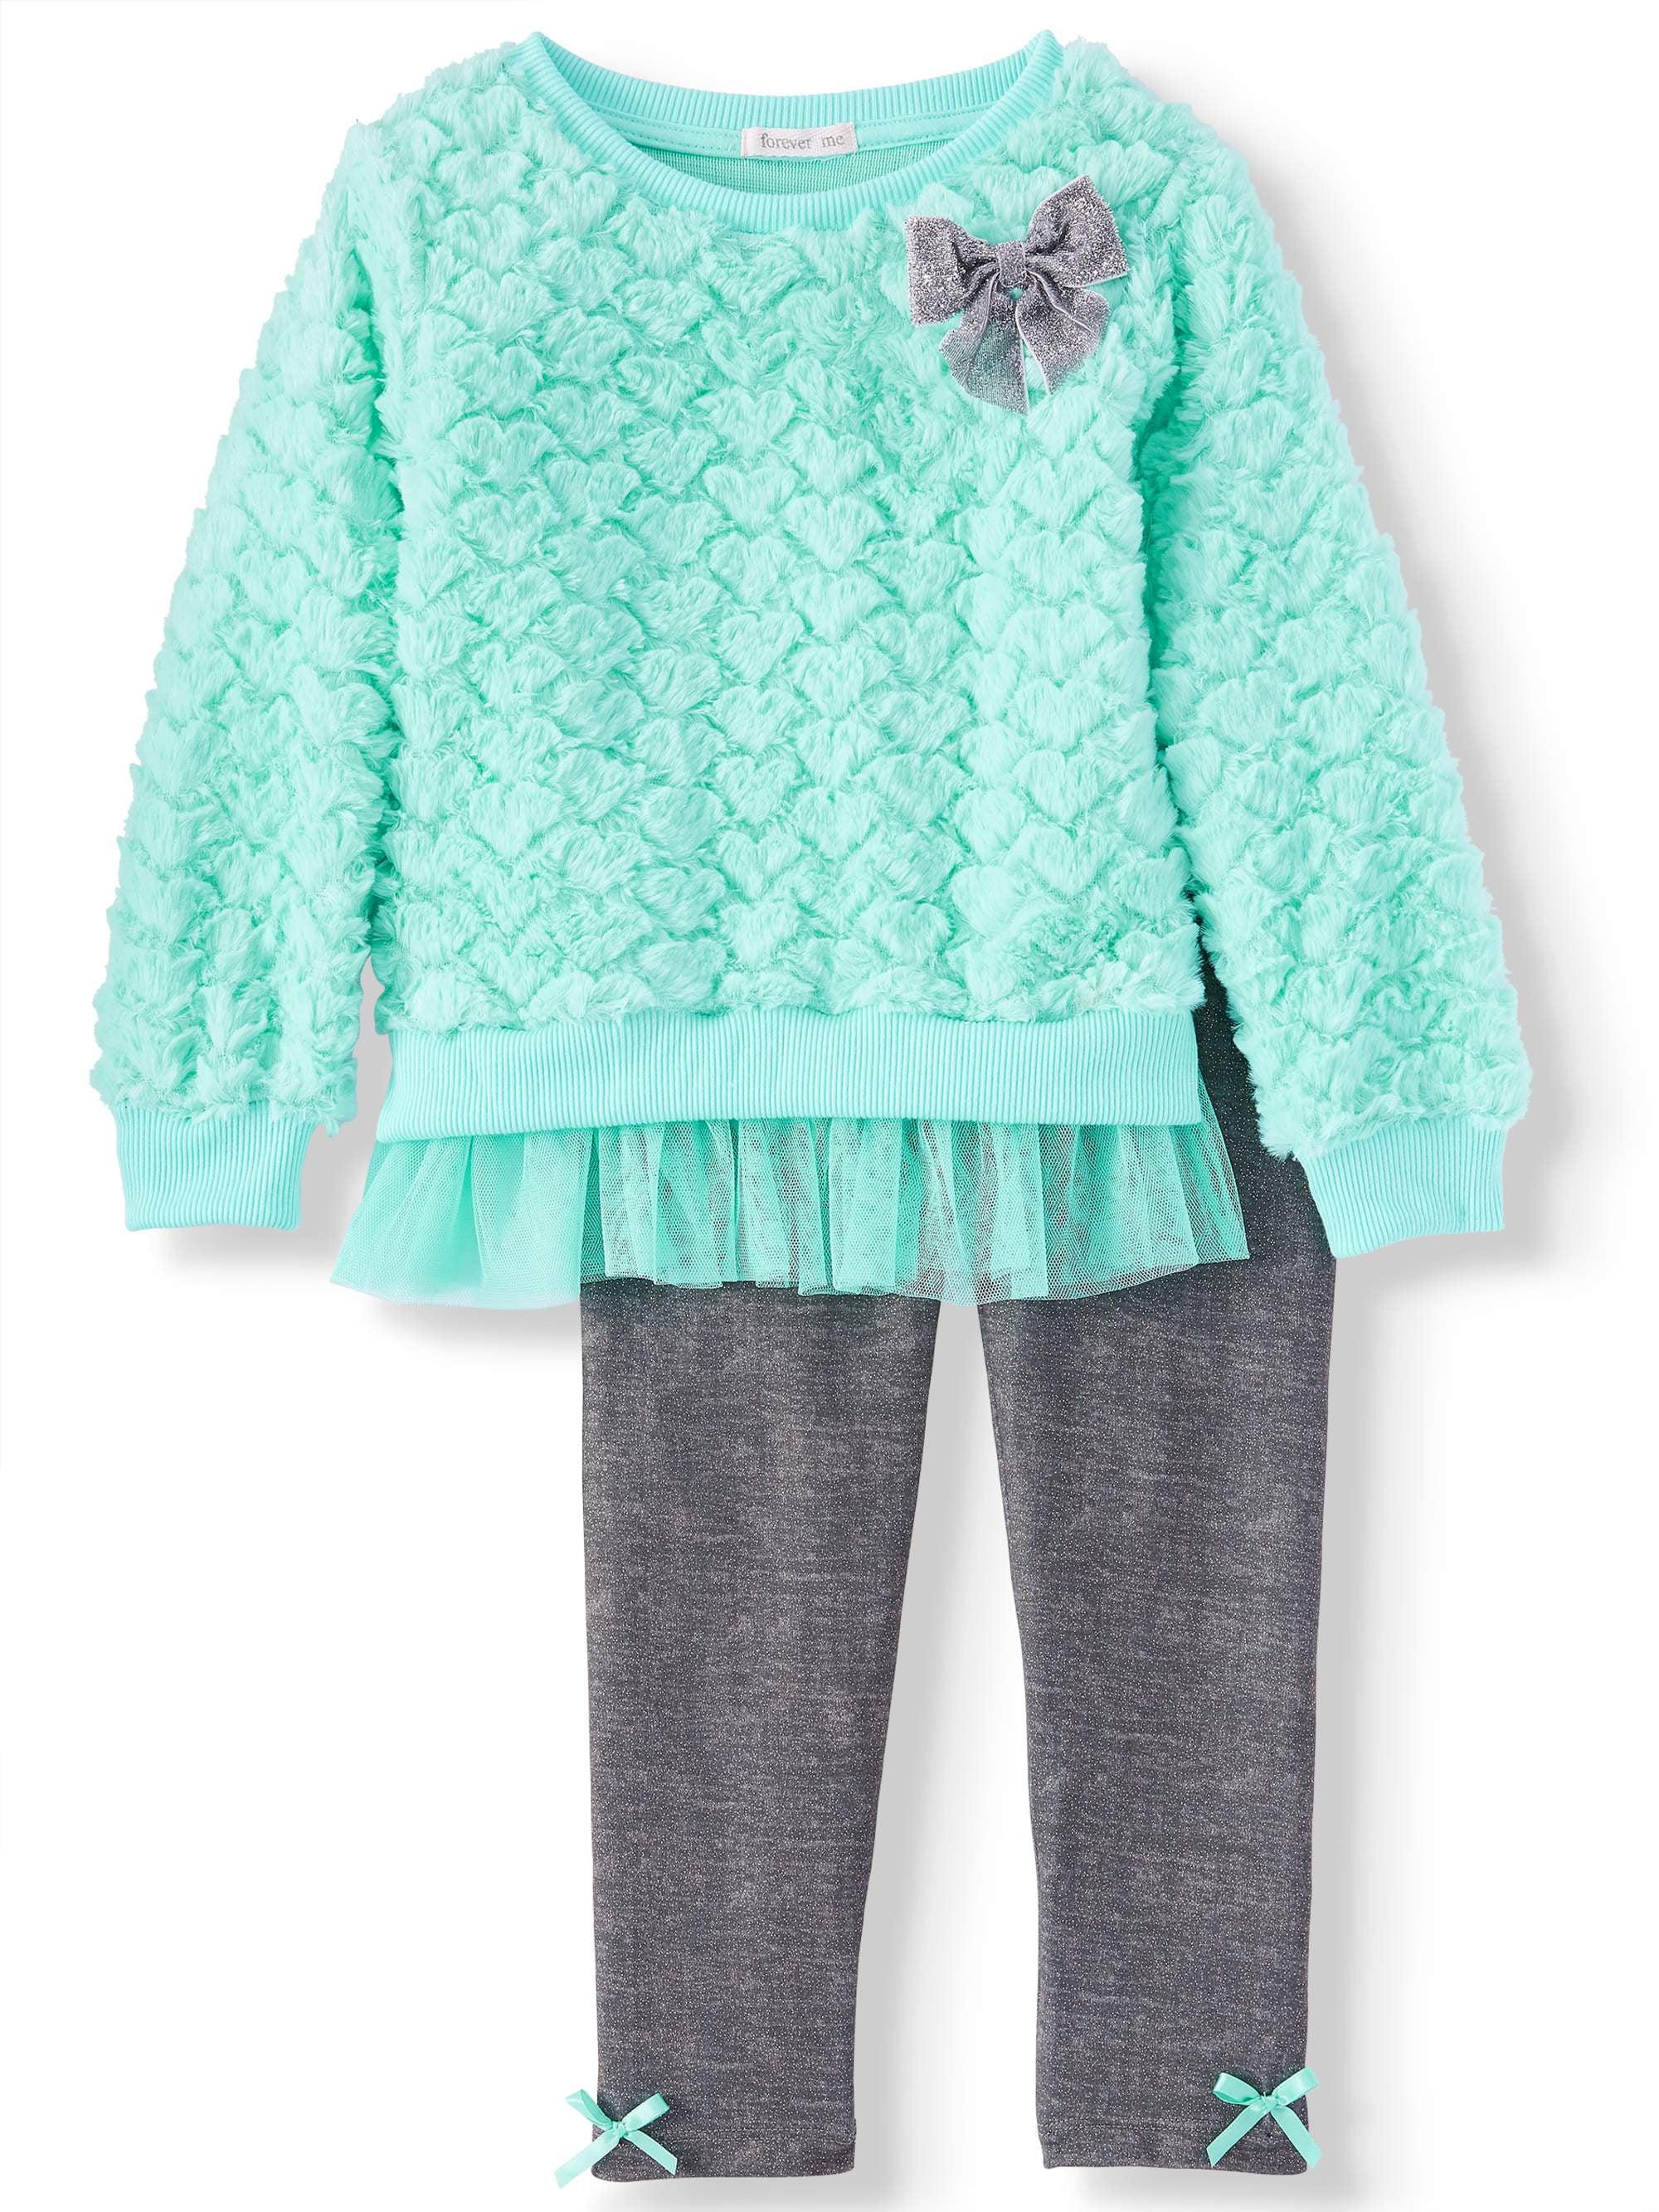 Embossed Plush Sweatshirt and Metallic Legging, 2-Piece Outfit Set (Little Girls)